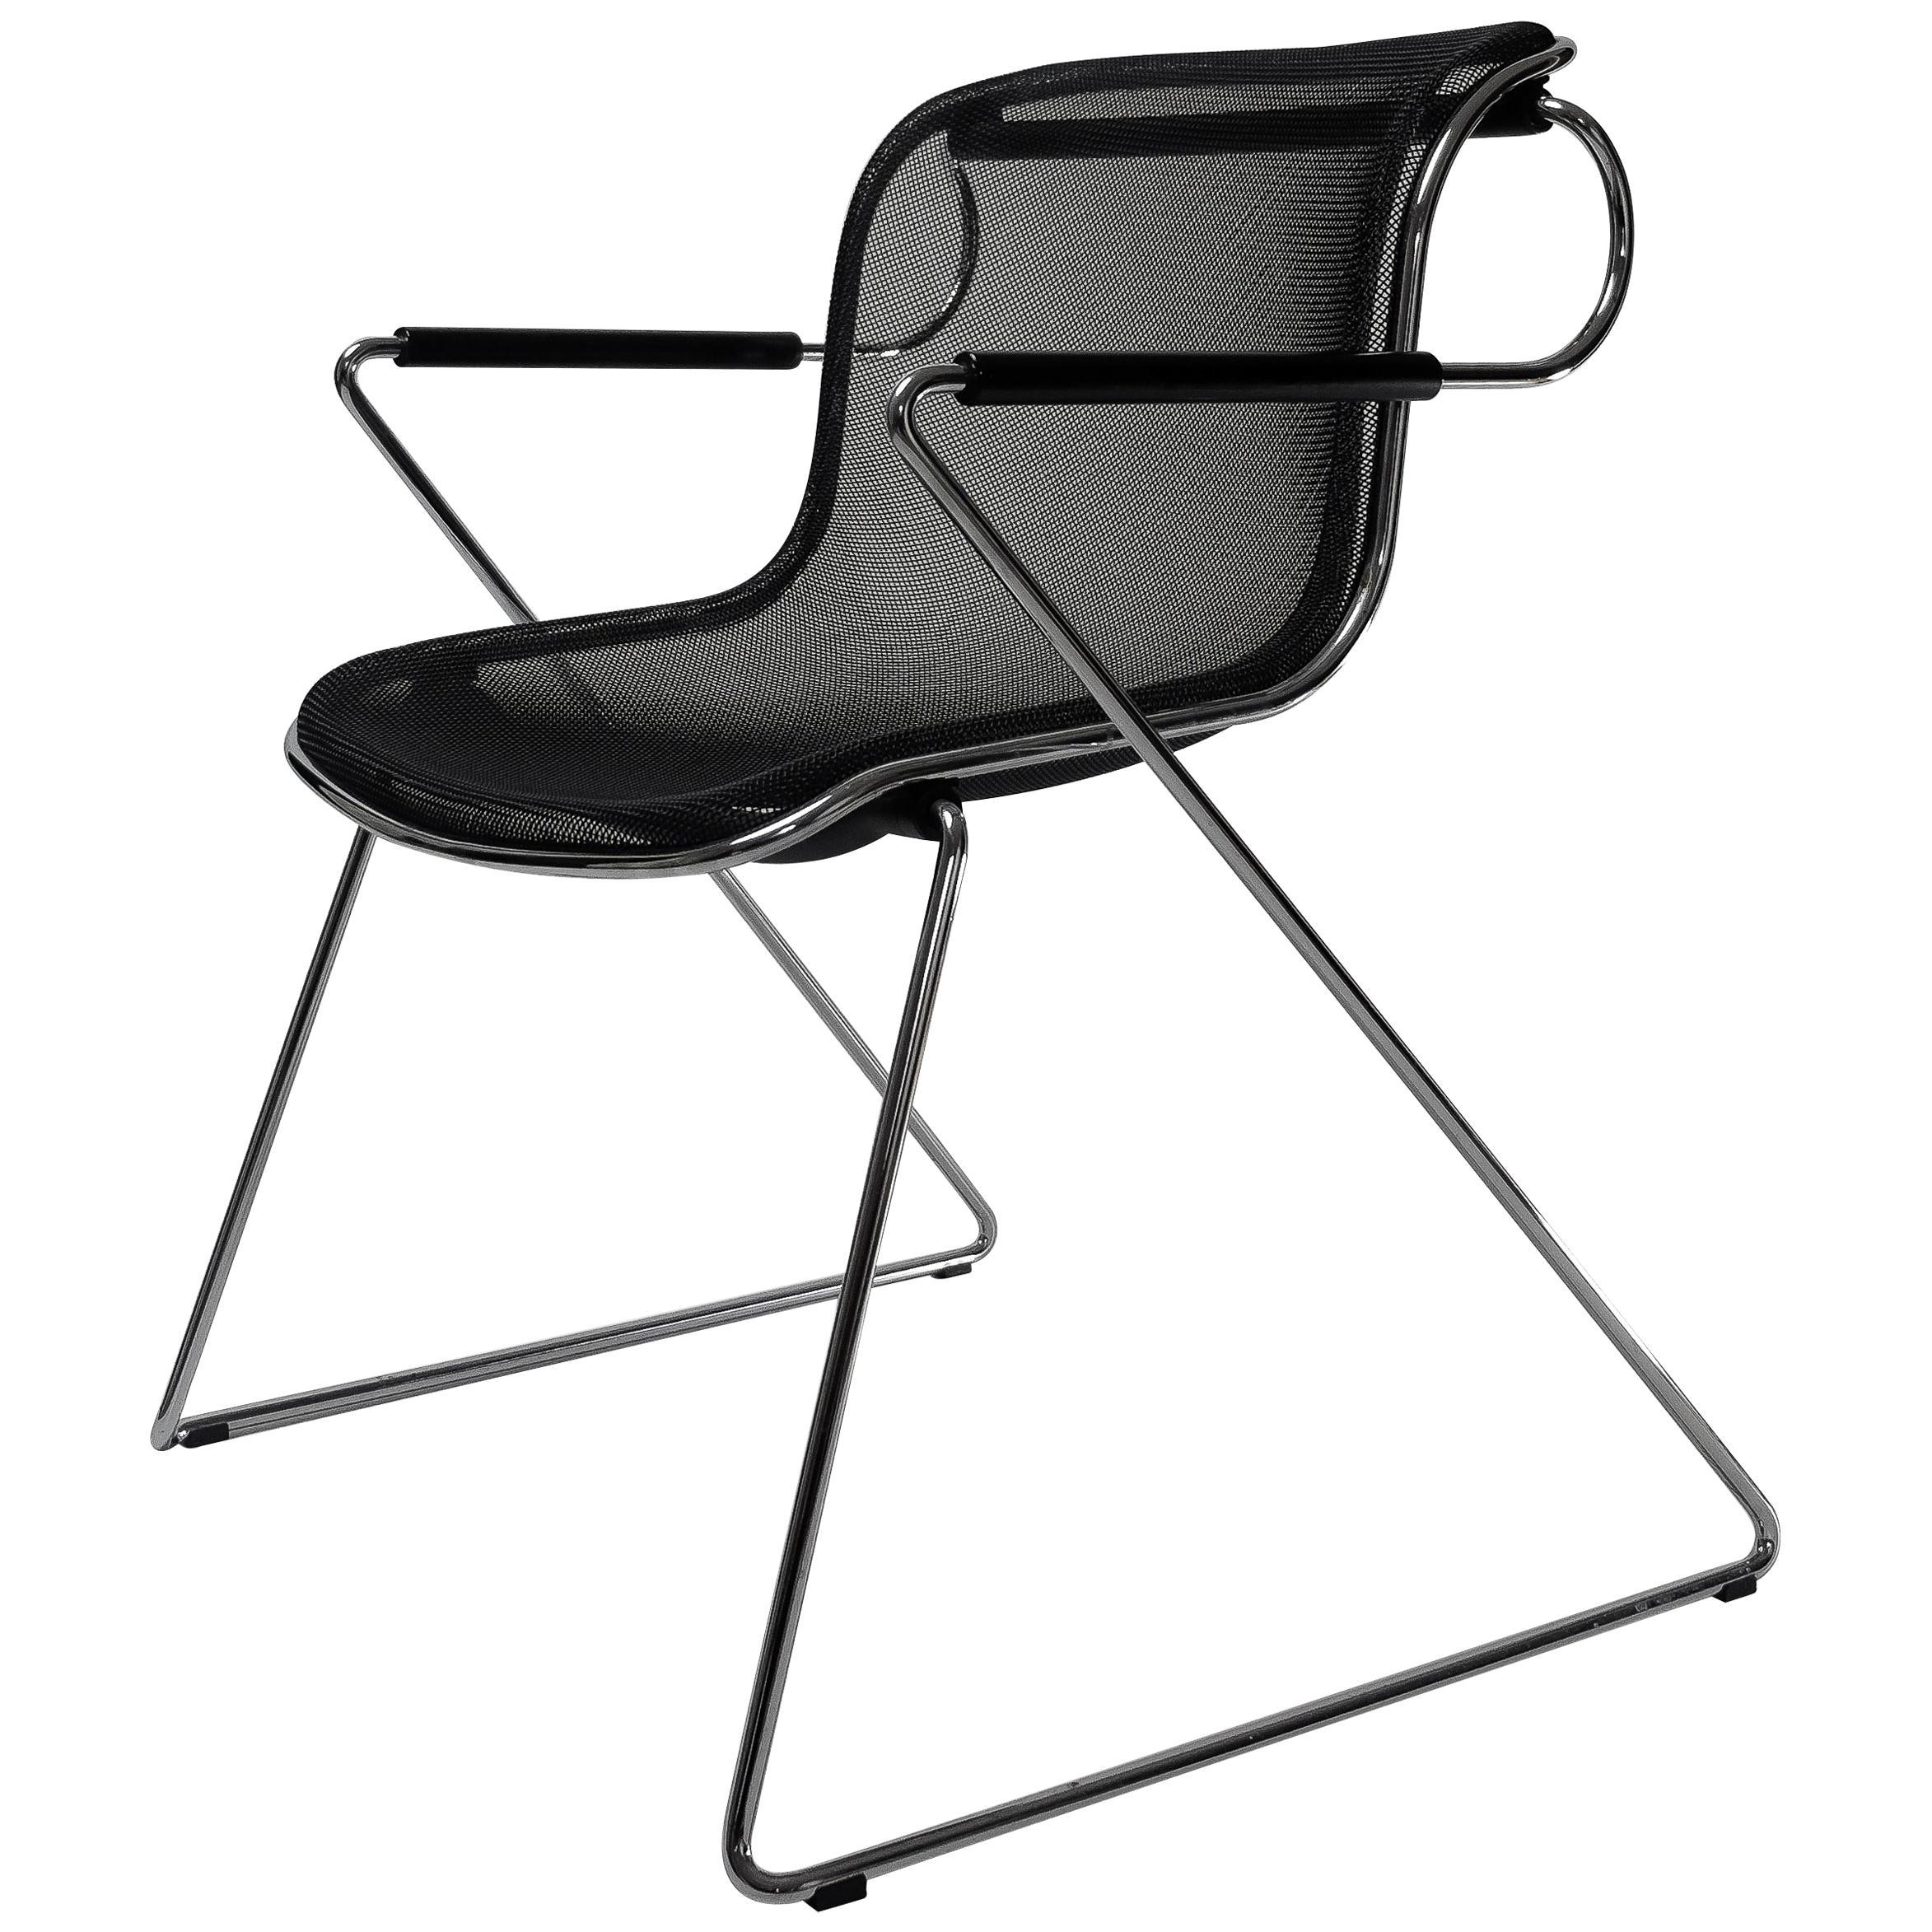 Italian Design Classic Pollock Penelope Chairs, by Castelli